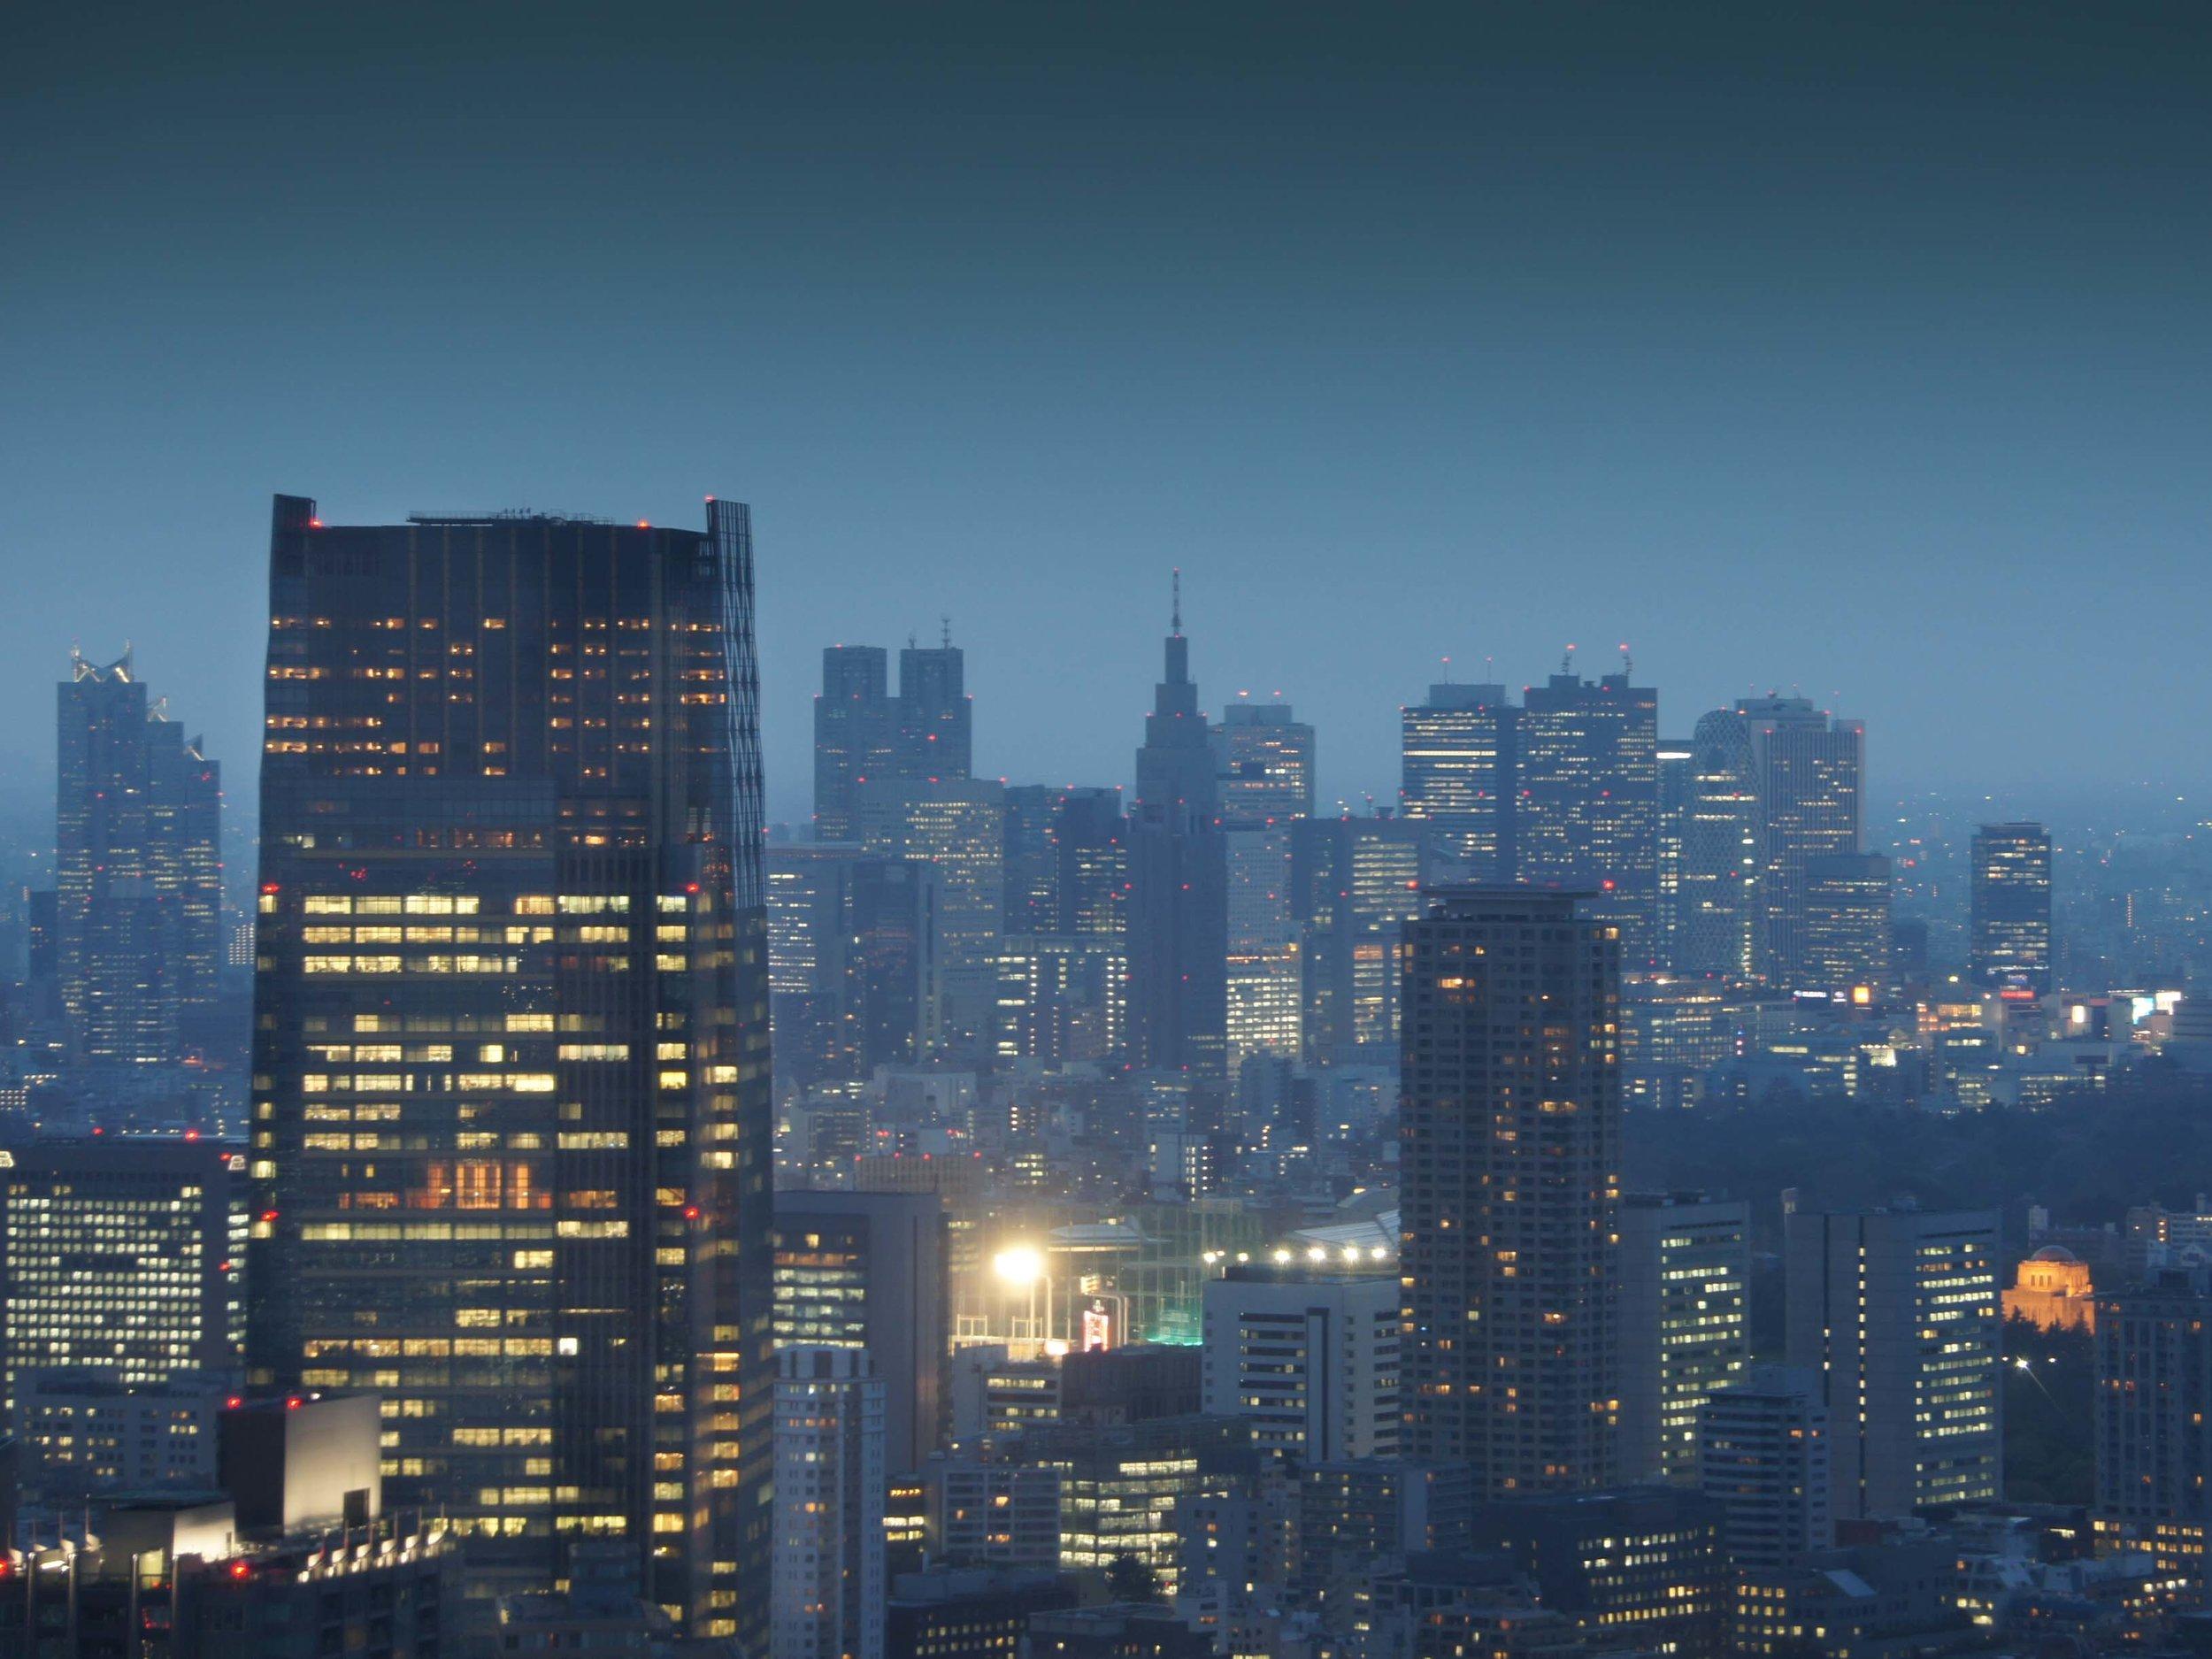 Night Blue Skyline Before.jpg